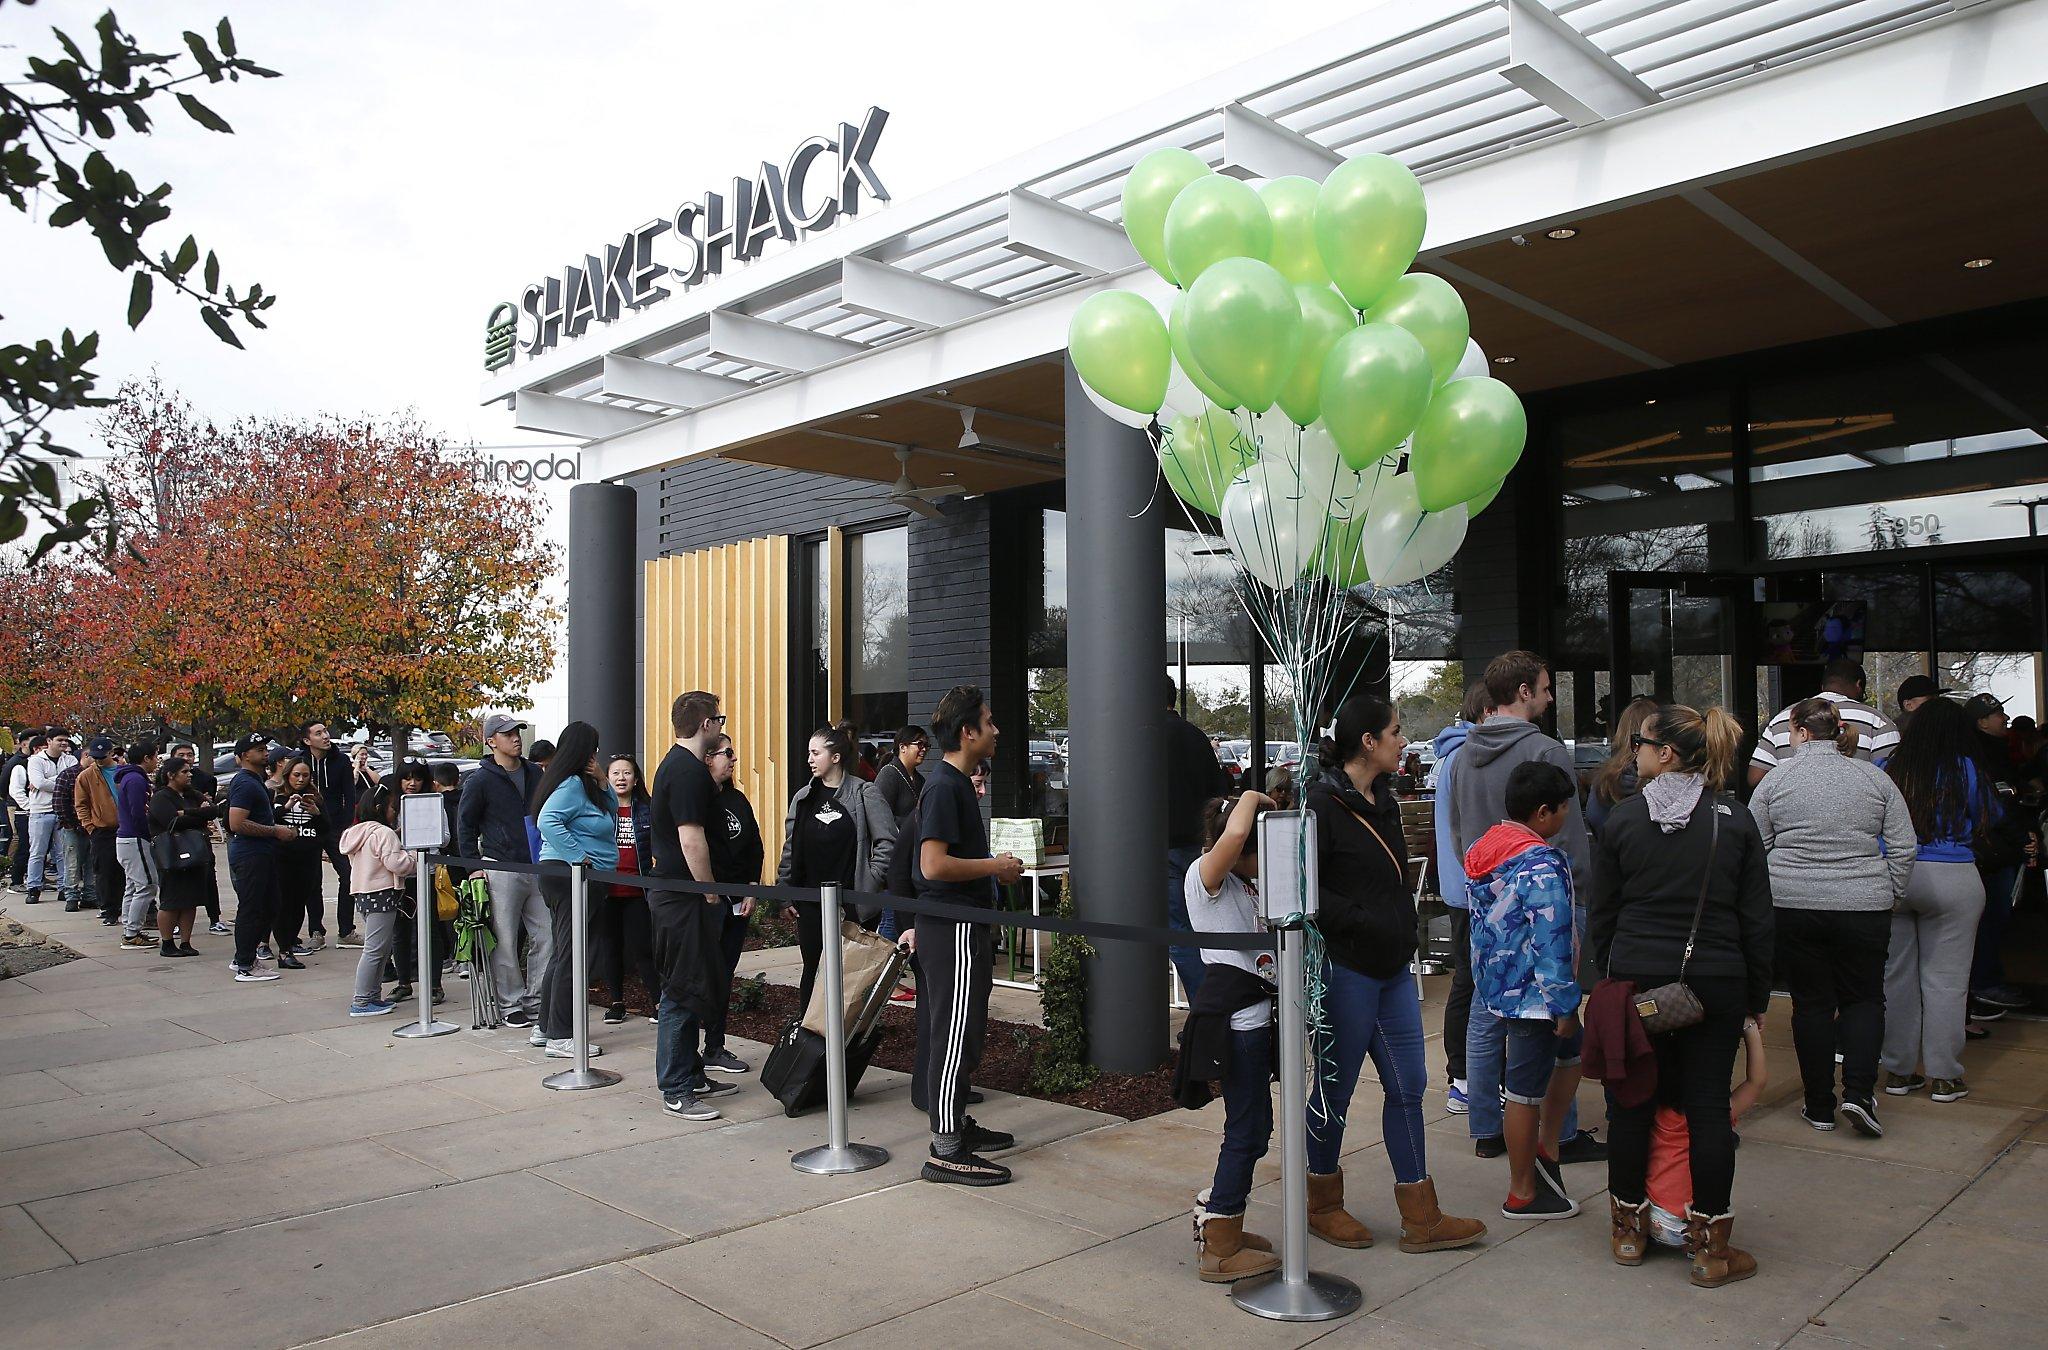 Bay Areas First Shake Shack Burger Shop Shakes Up Palo Alto Crowd